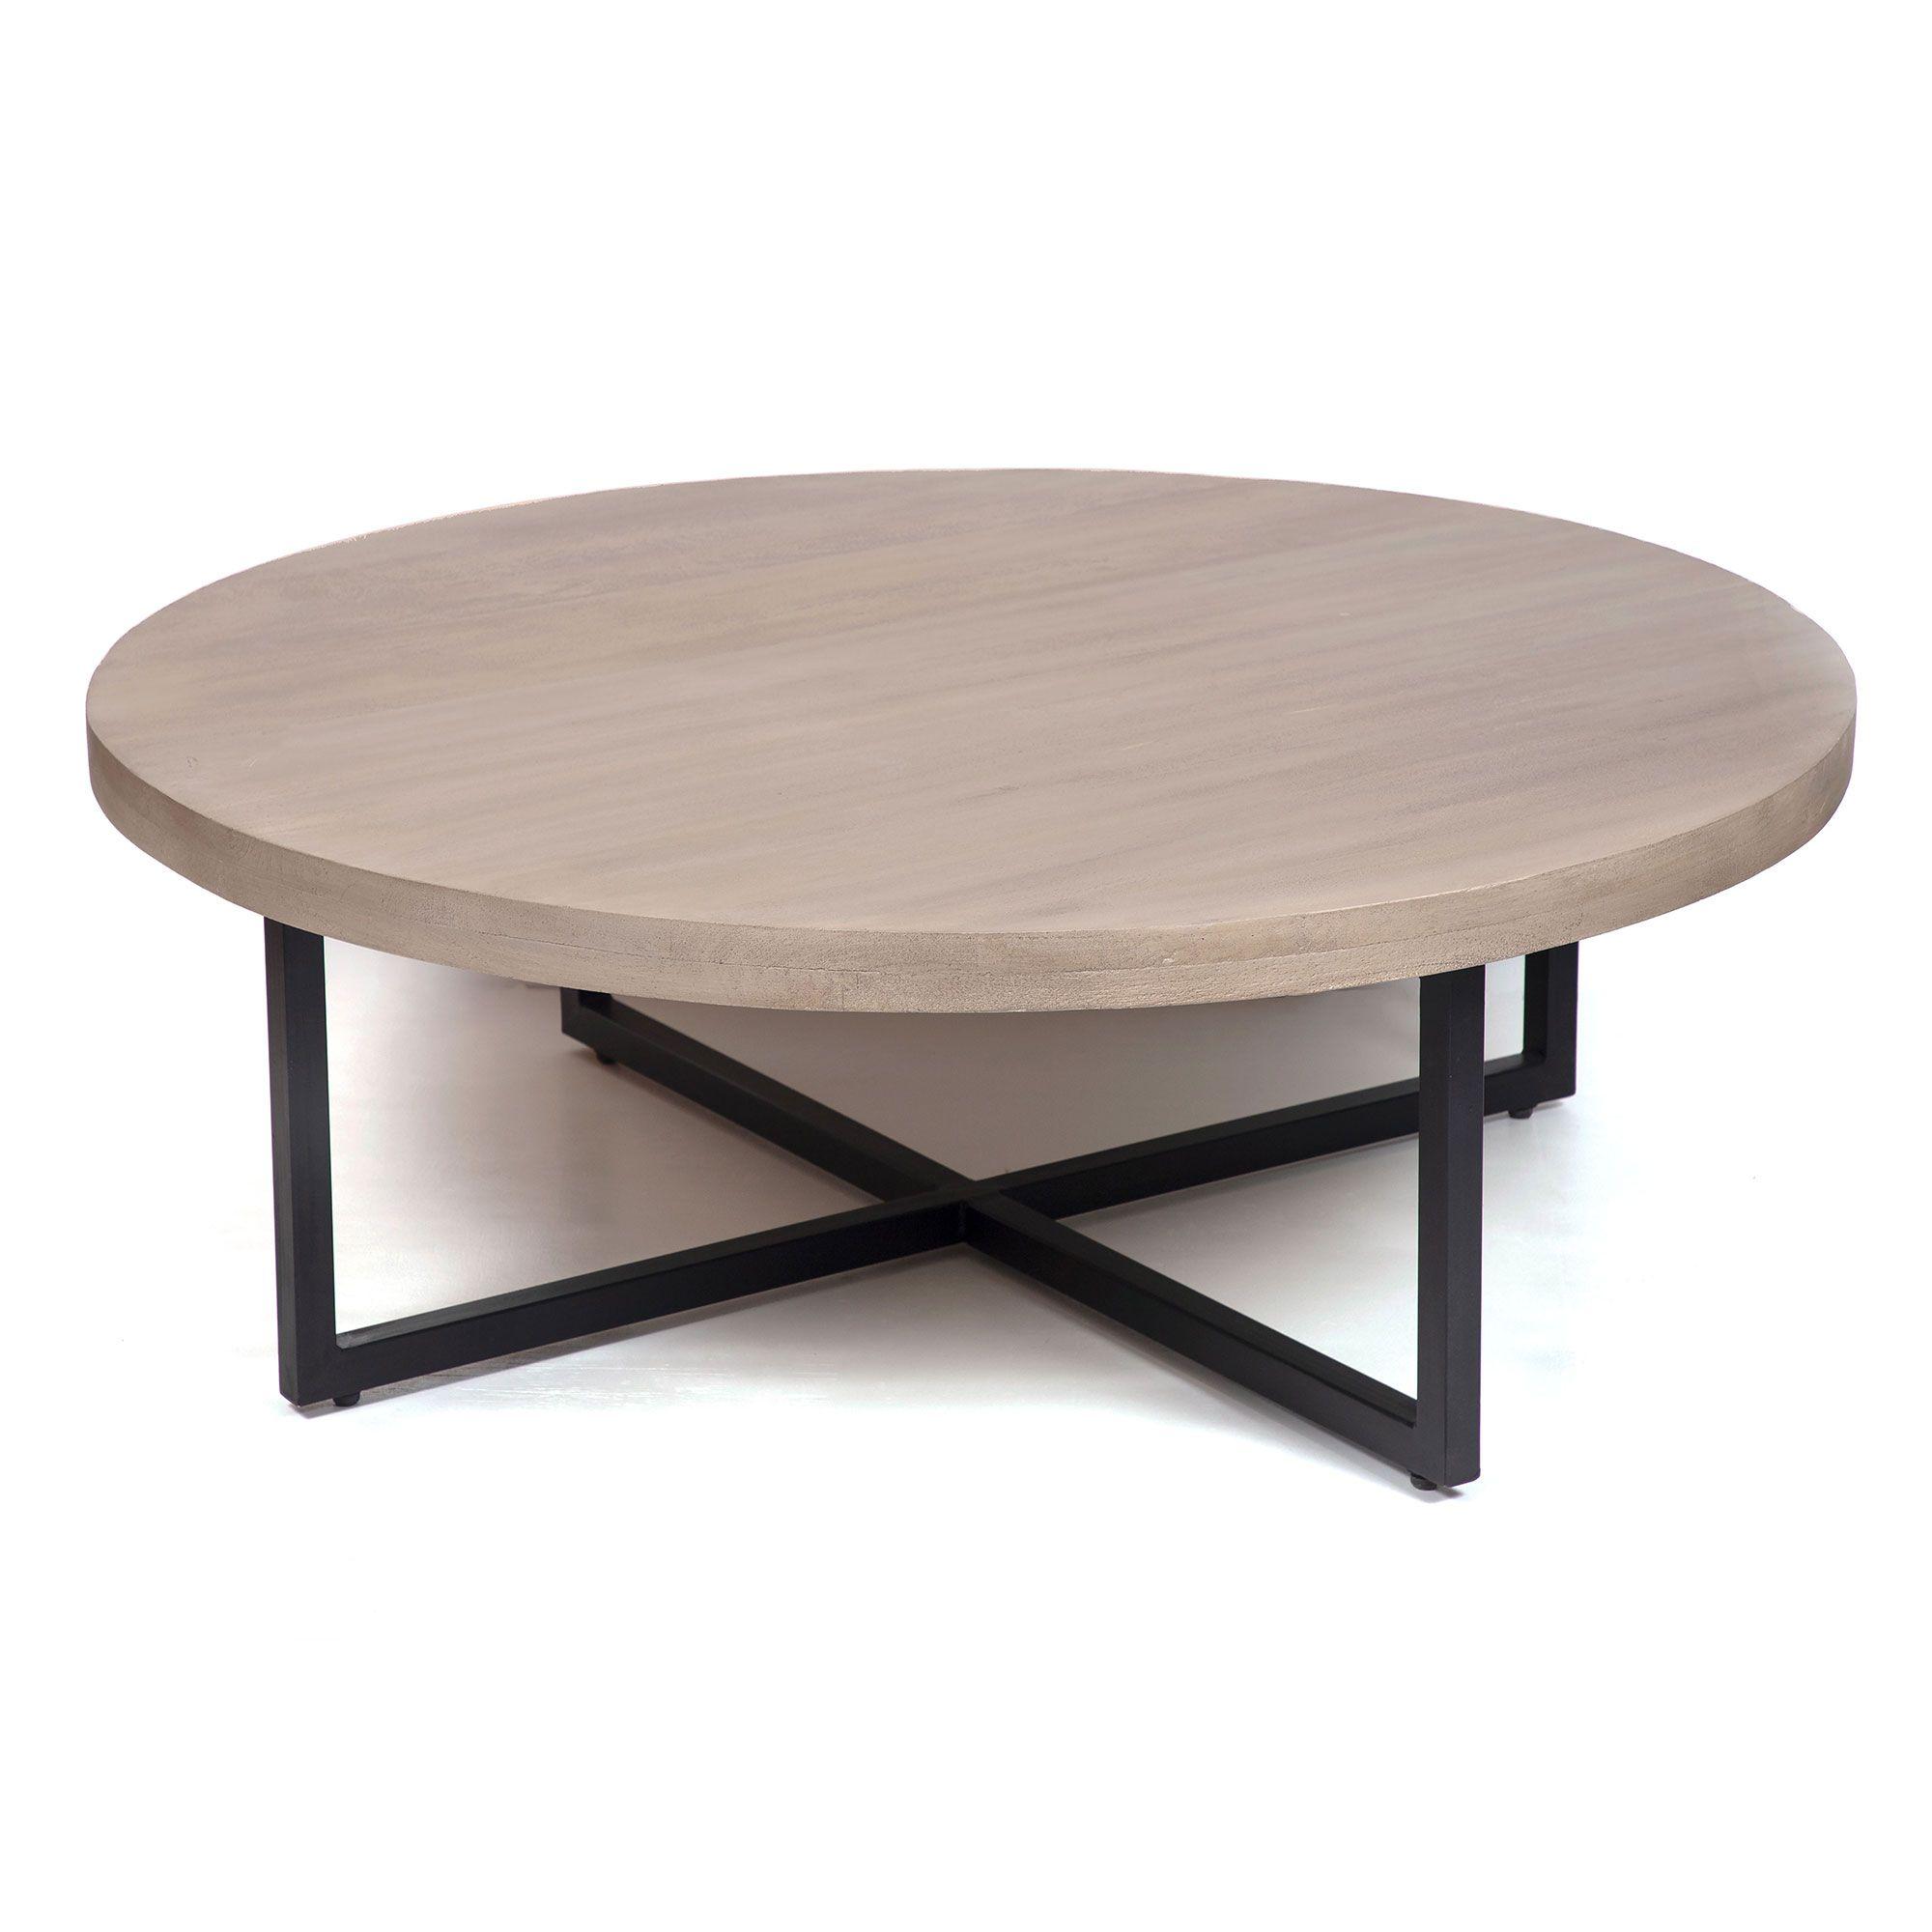 Malibu Round Coffee Table Downeast Home In 2021 Coffee Table Round Coffee Table Table [ 2000 x 2000 Pixel ]